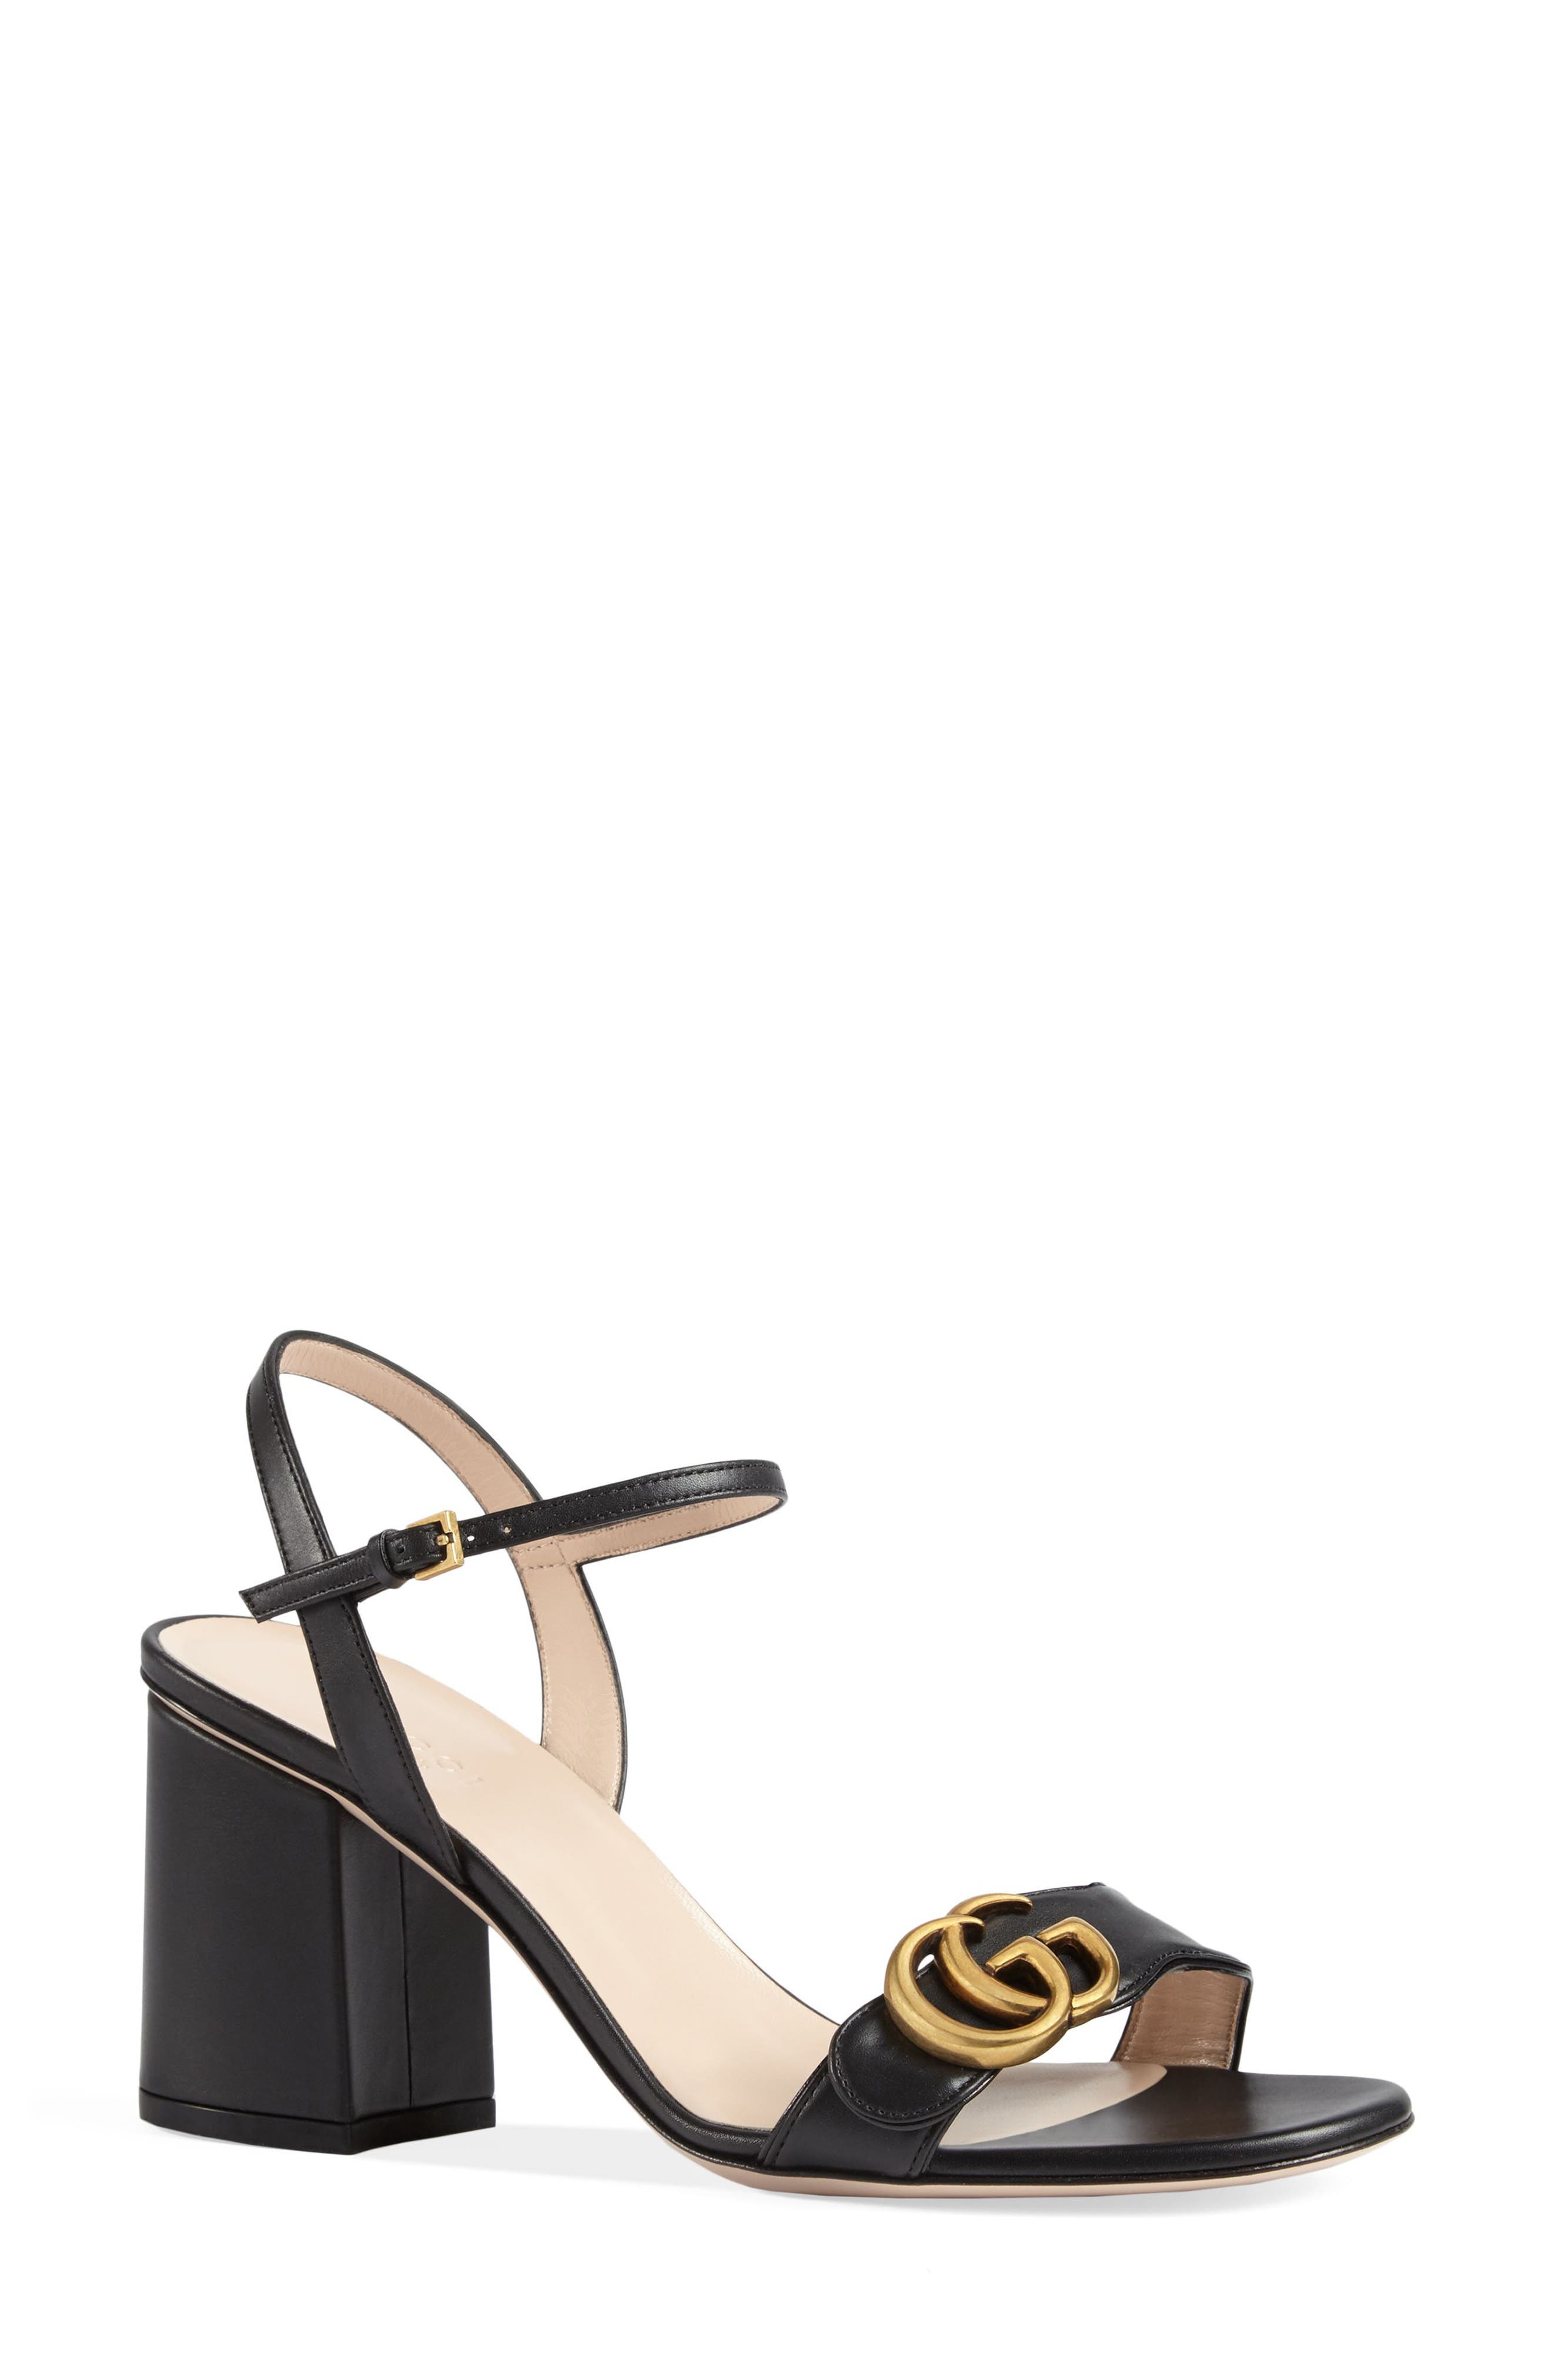 GG Marmont Sandal,                         Main,                         color, BLACK LEATHER